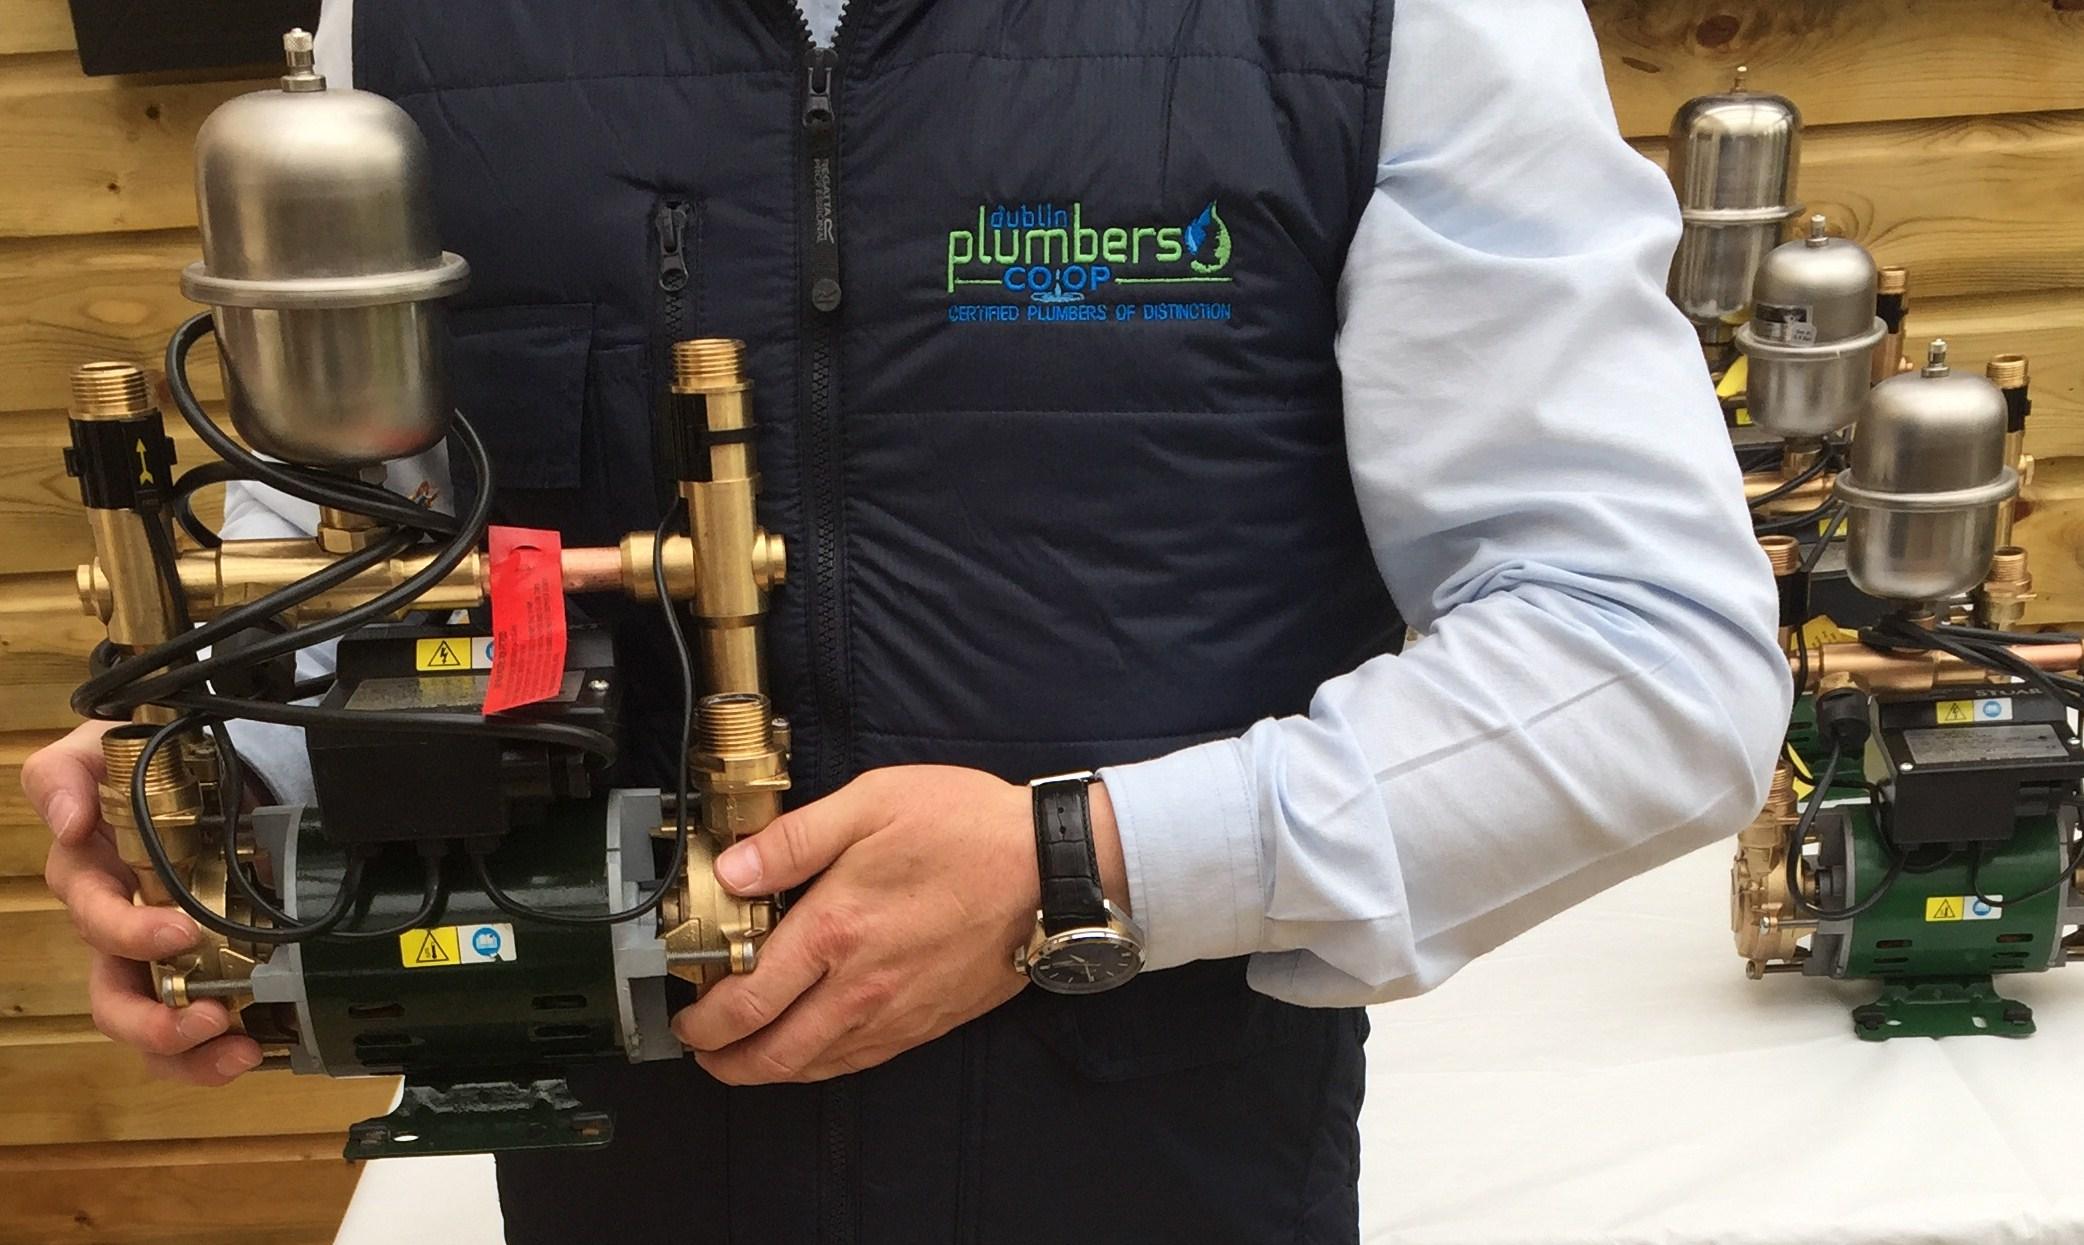 <div class='slider_caption'>                                                      <h1>Stuart Turner negative & positive head shower pumps.</h1>                                                      <a class='slider-readmore' href='https://www.plumber-dublin.ie/stuart-tuner-negative-head-shower-pump-replacement/'>                                                      Read More                                                     </a>                                                      </div>